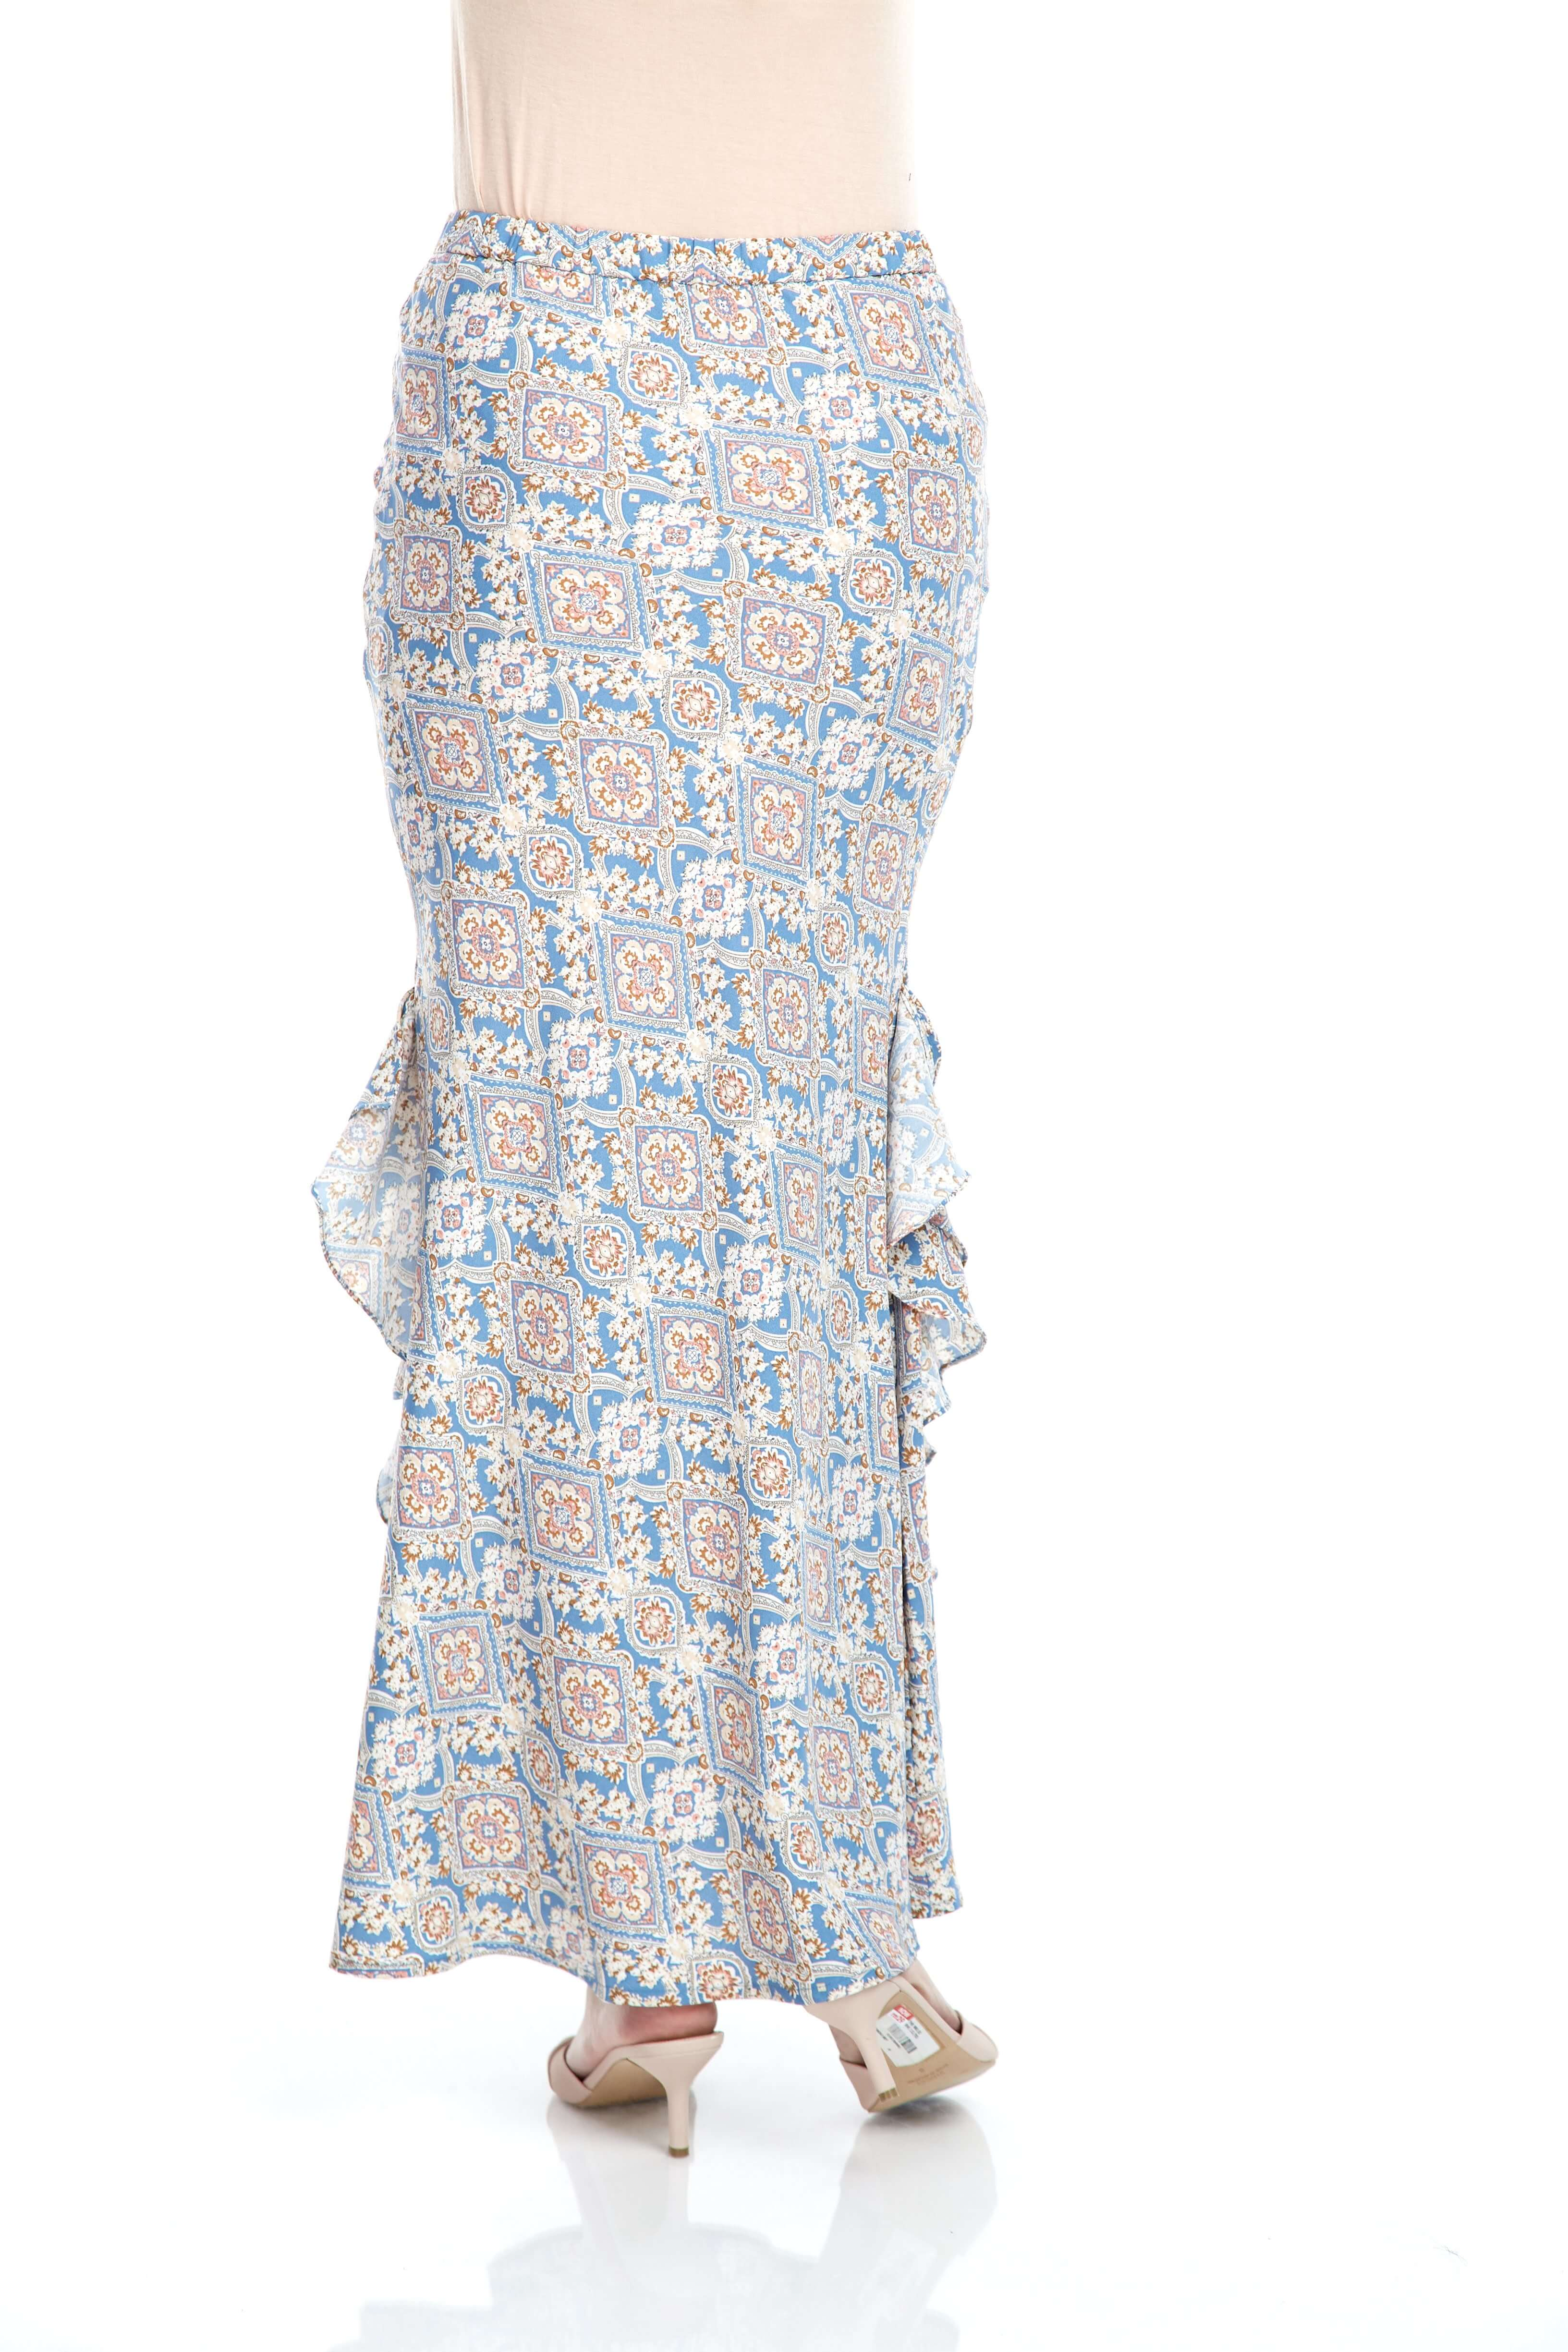 Blue Printed Ruffle Mermaid Skirt (5)